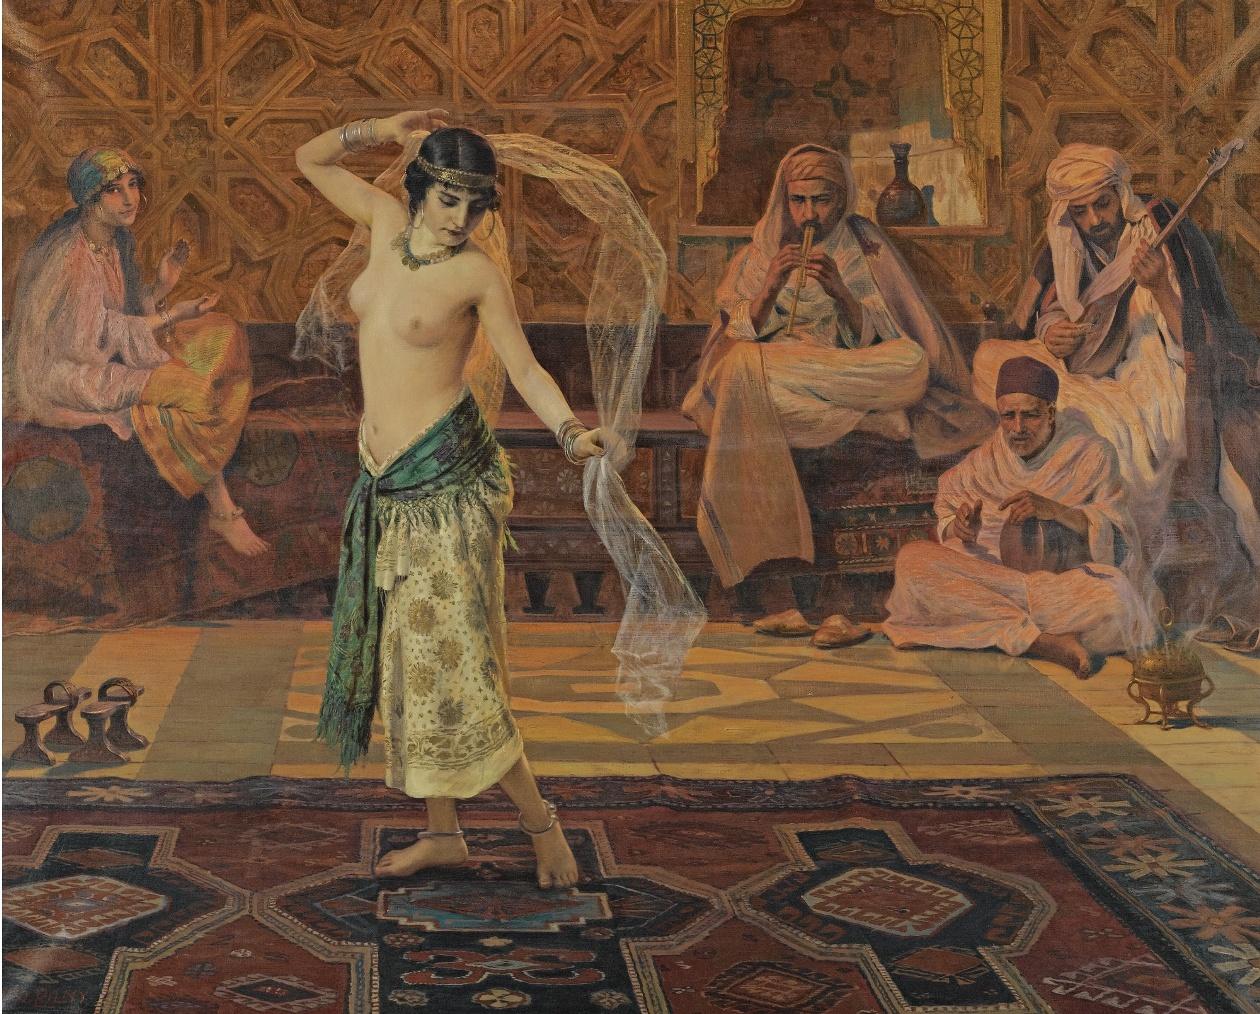 Erotic dance painting